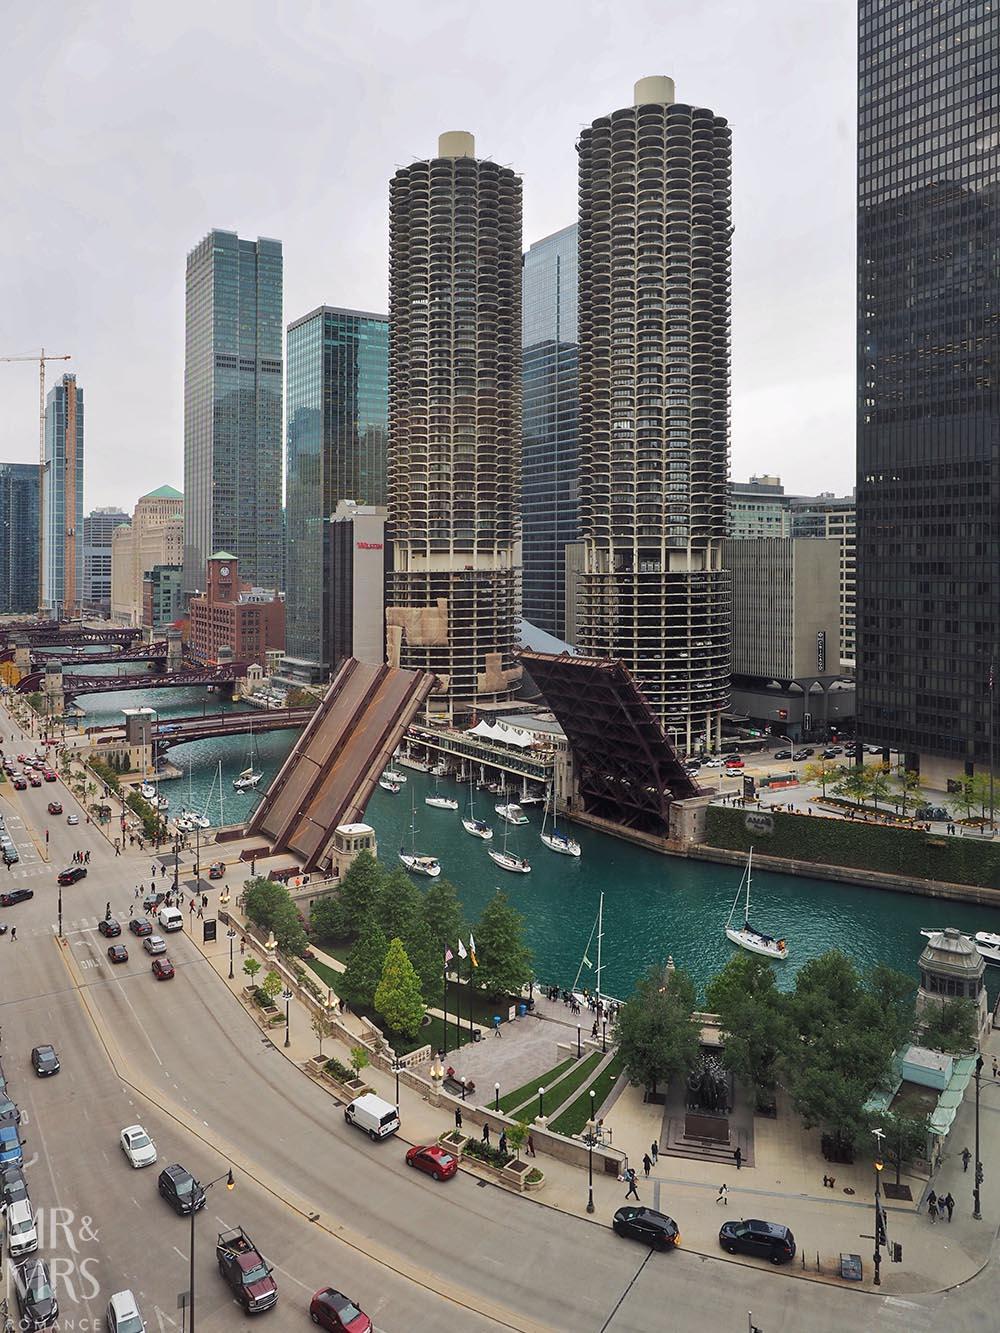 Chicago bridges lifting, Chicago, IL